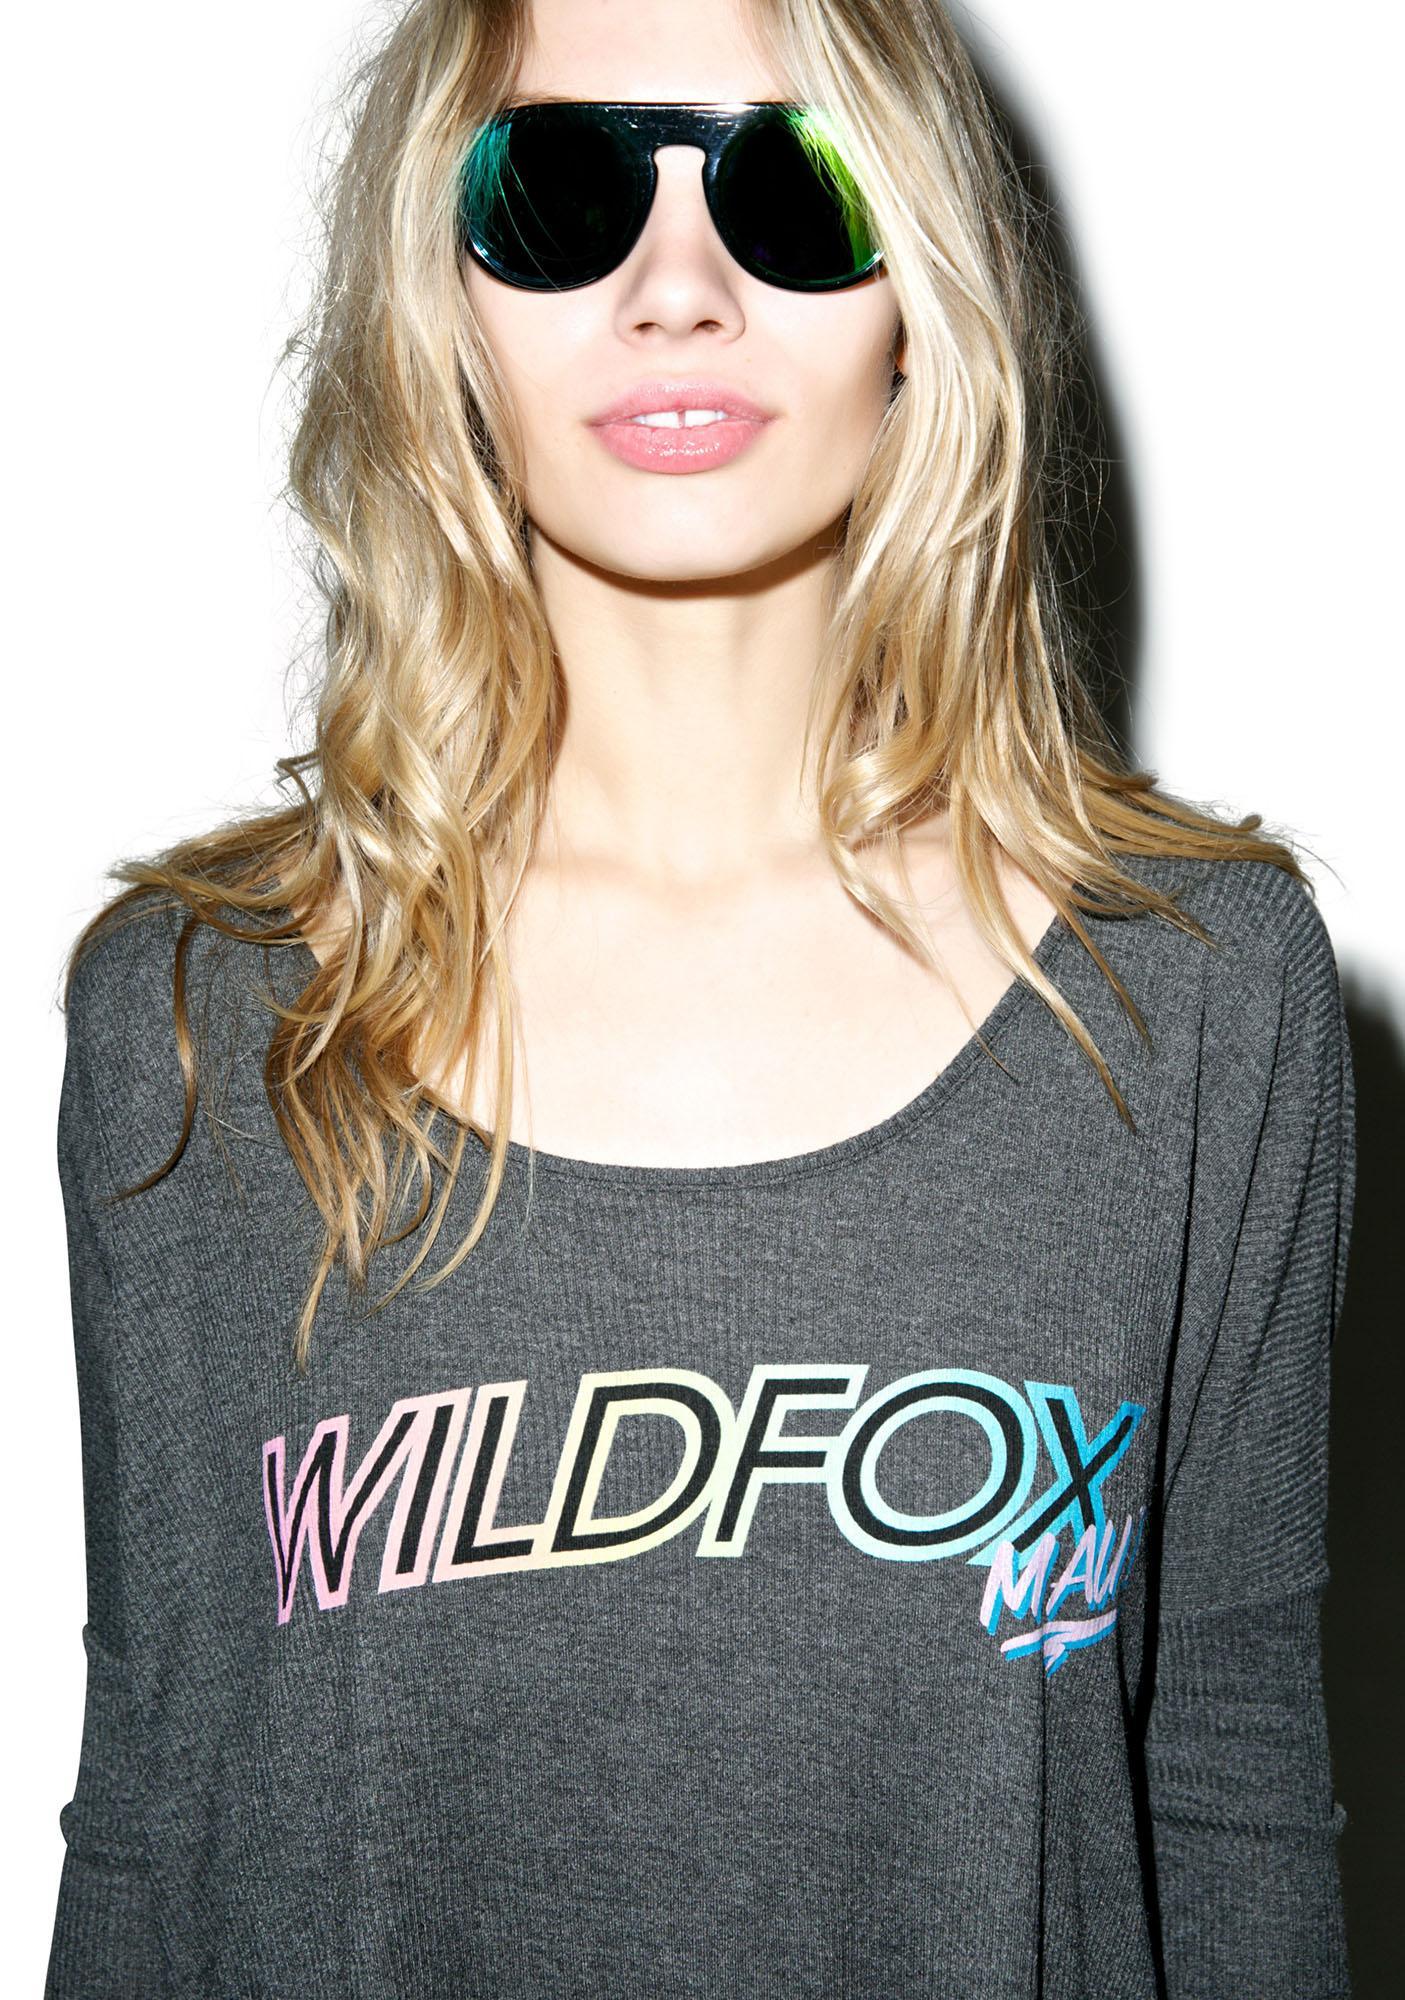 Wildfox Couture Wildfox Maui Bonfire Beach Tee